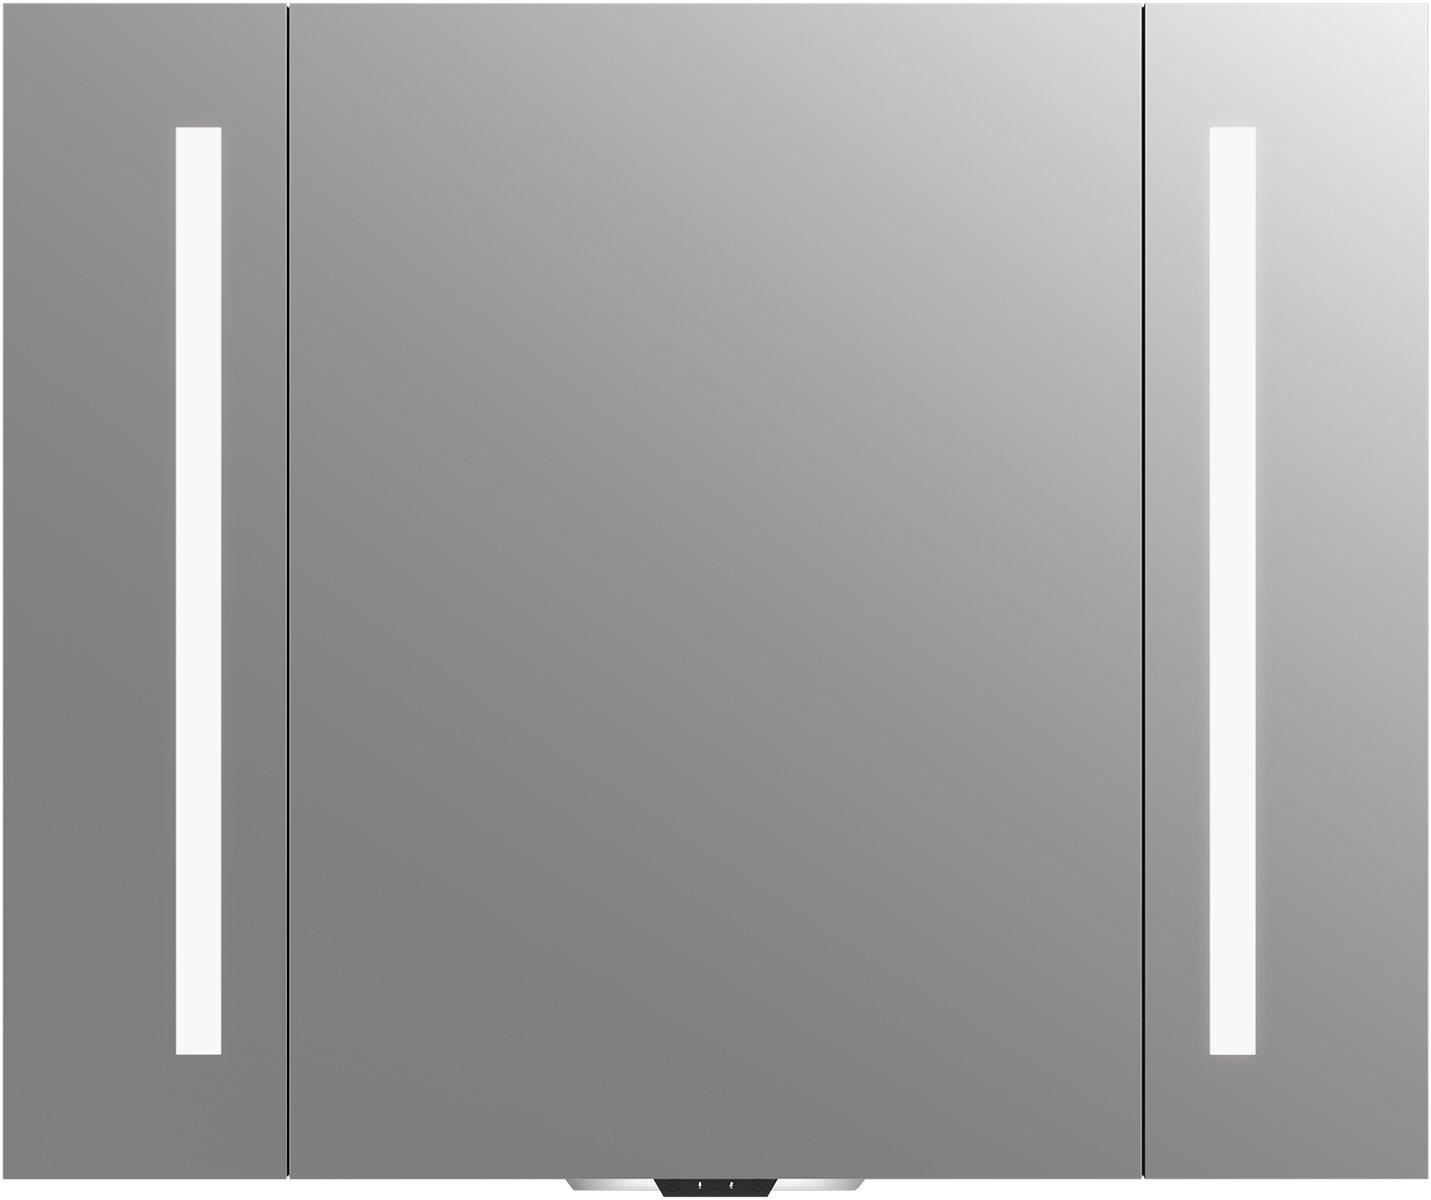 KOHLER 99573-VLAN-NA Verdera Voice 40 in. x 33 in. Lighted Mirror- Works with Alexa by Kohler (Image #1)